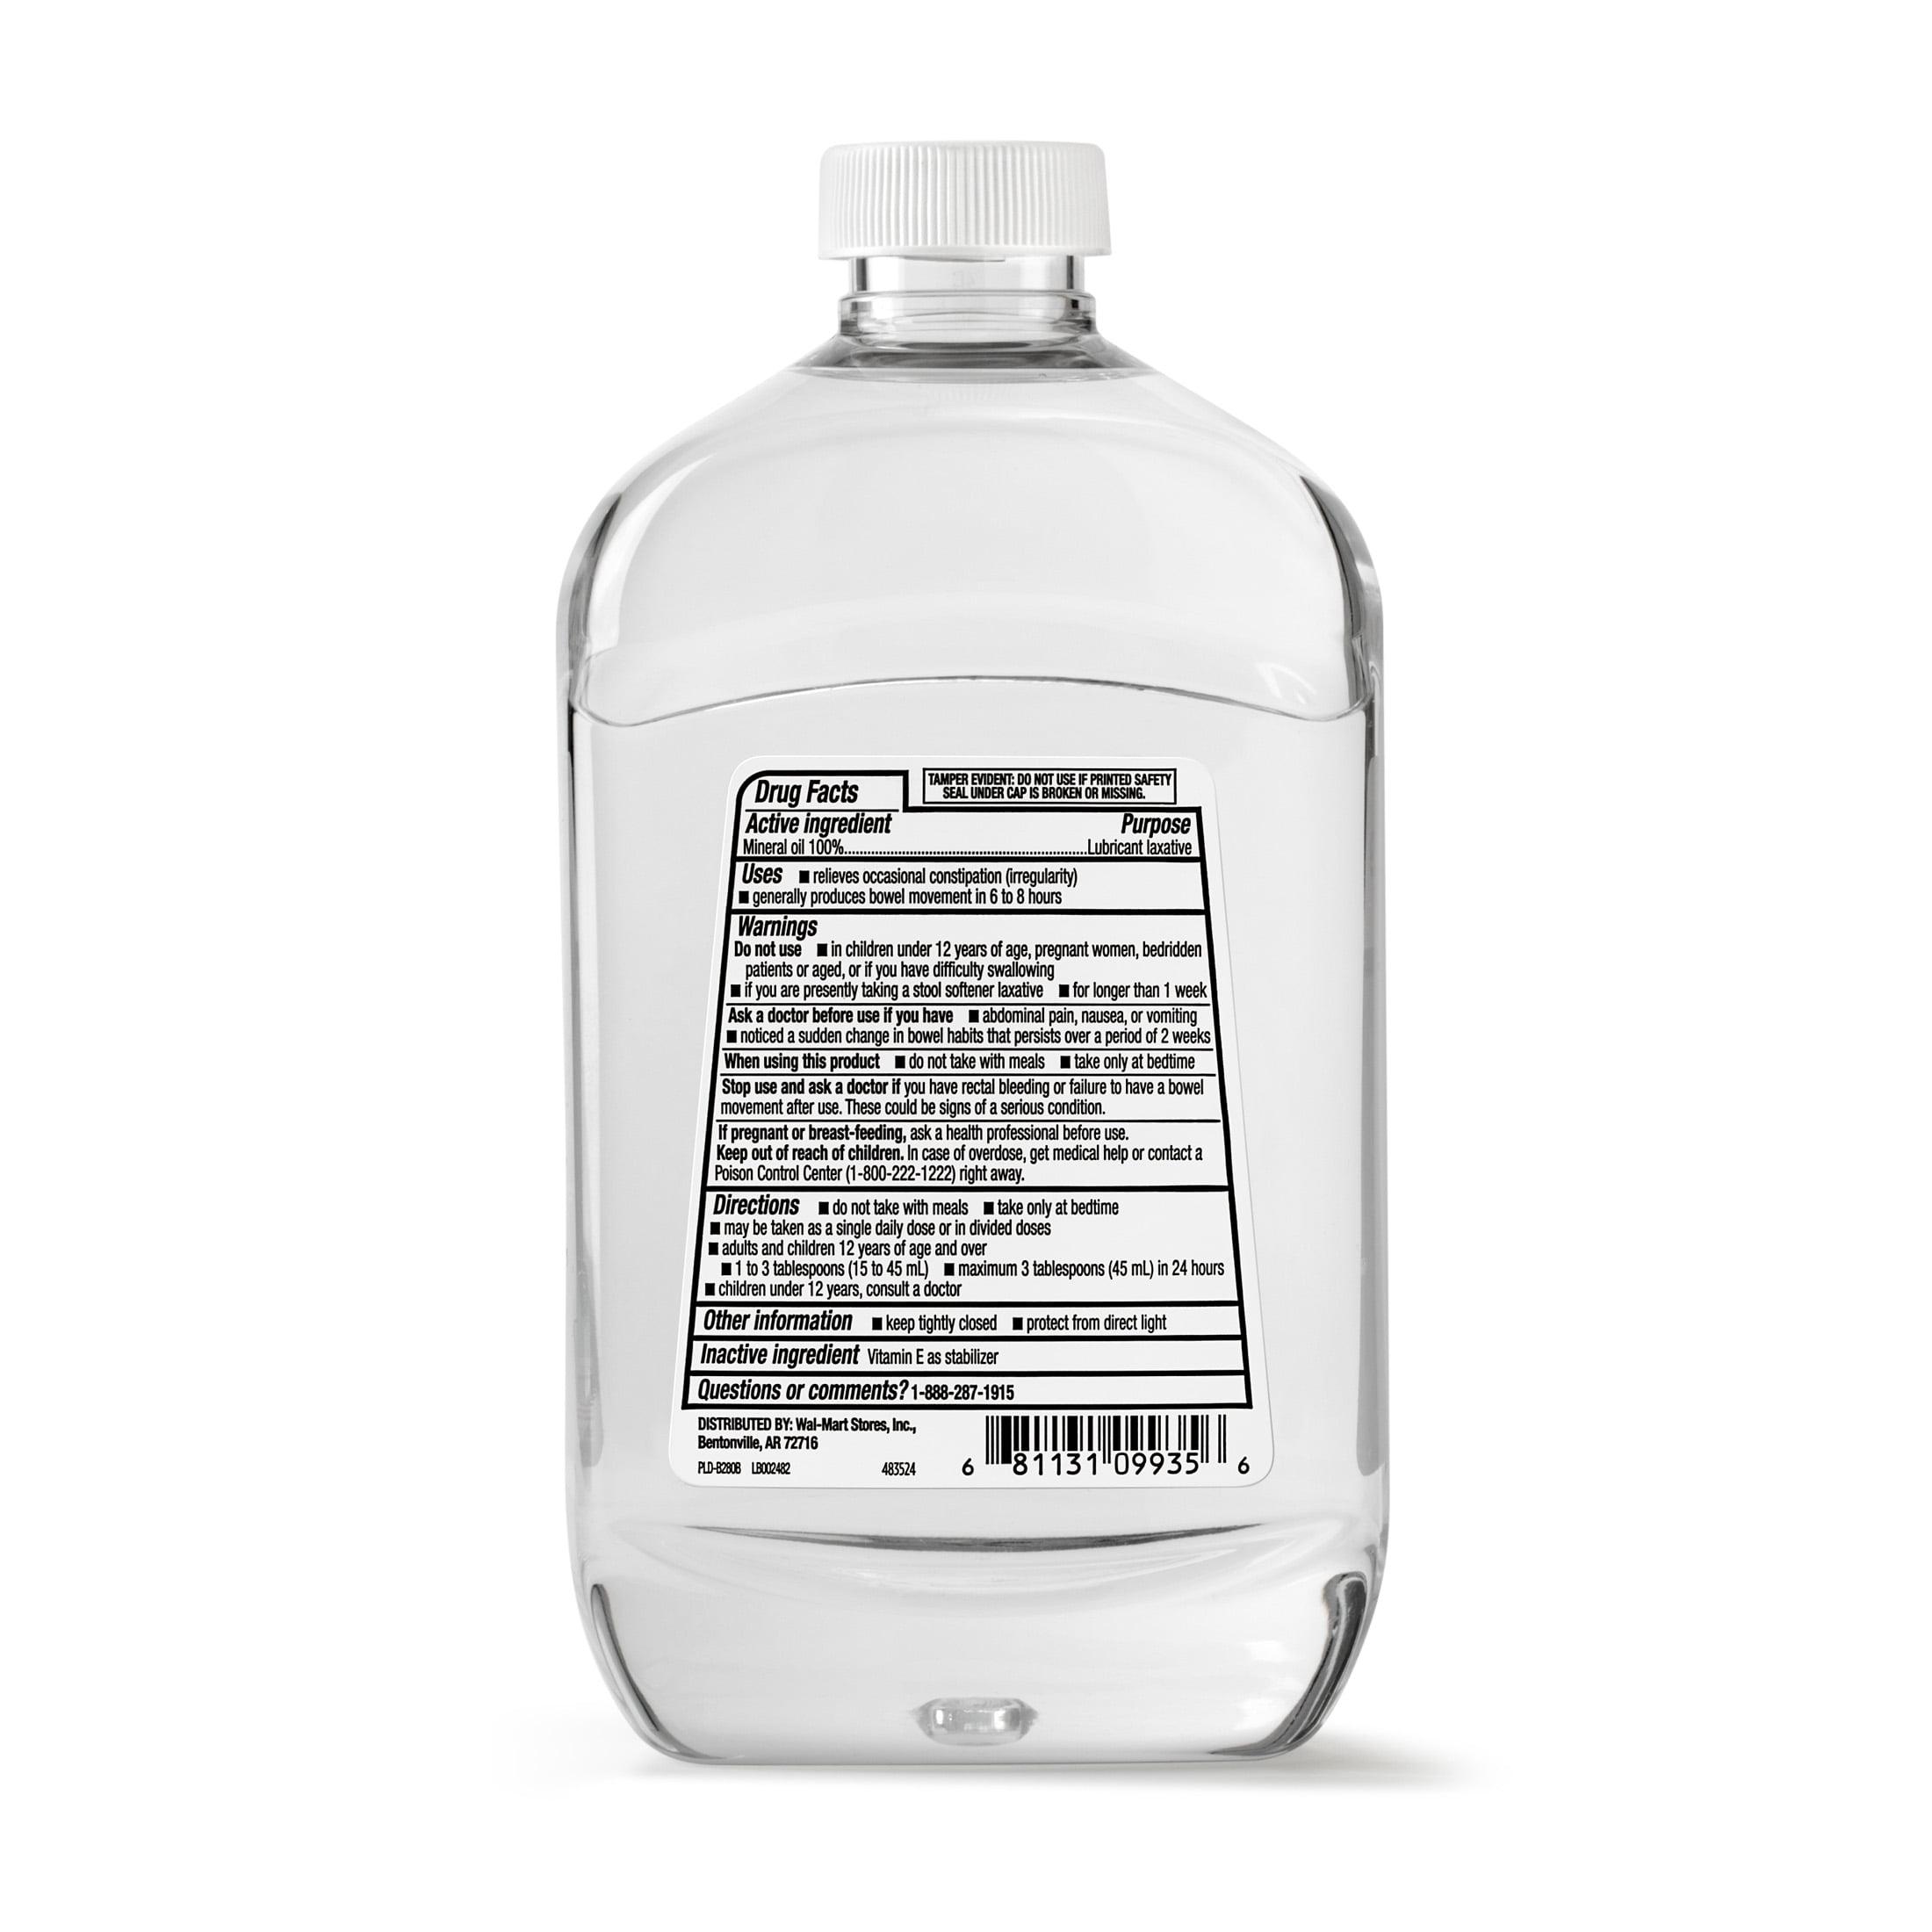 Equate Mineral Oil Lubricant Laxative, 16 fl oz